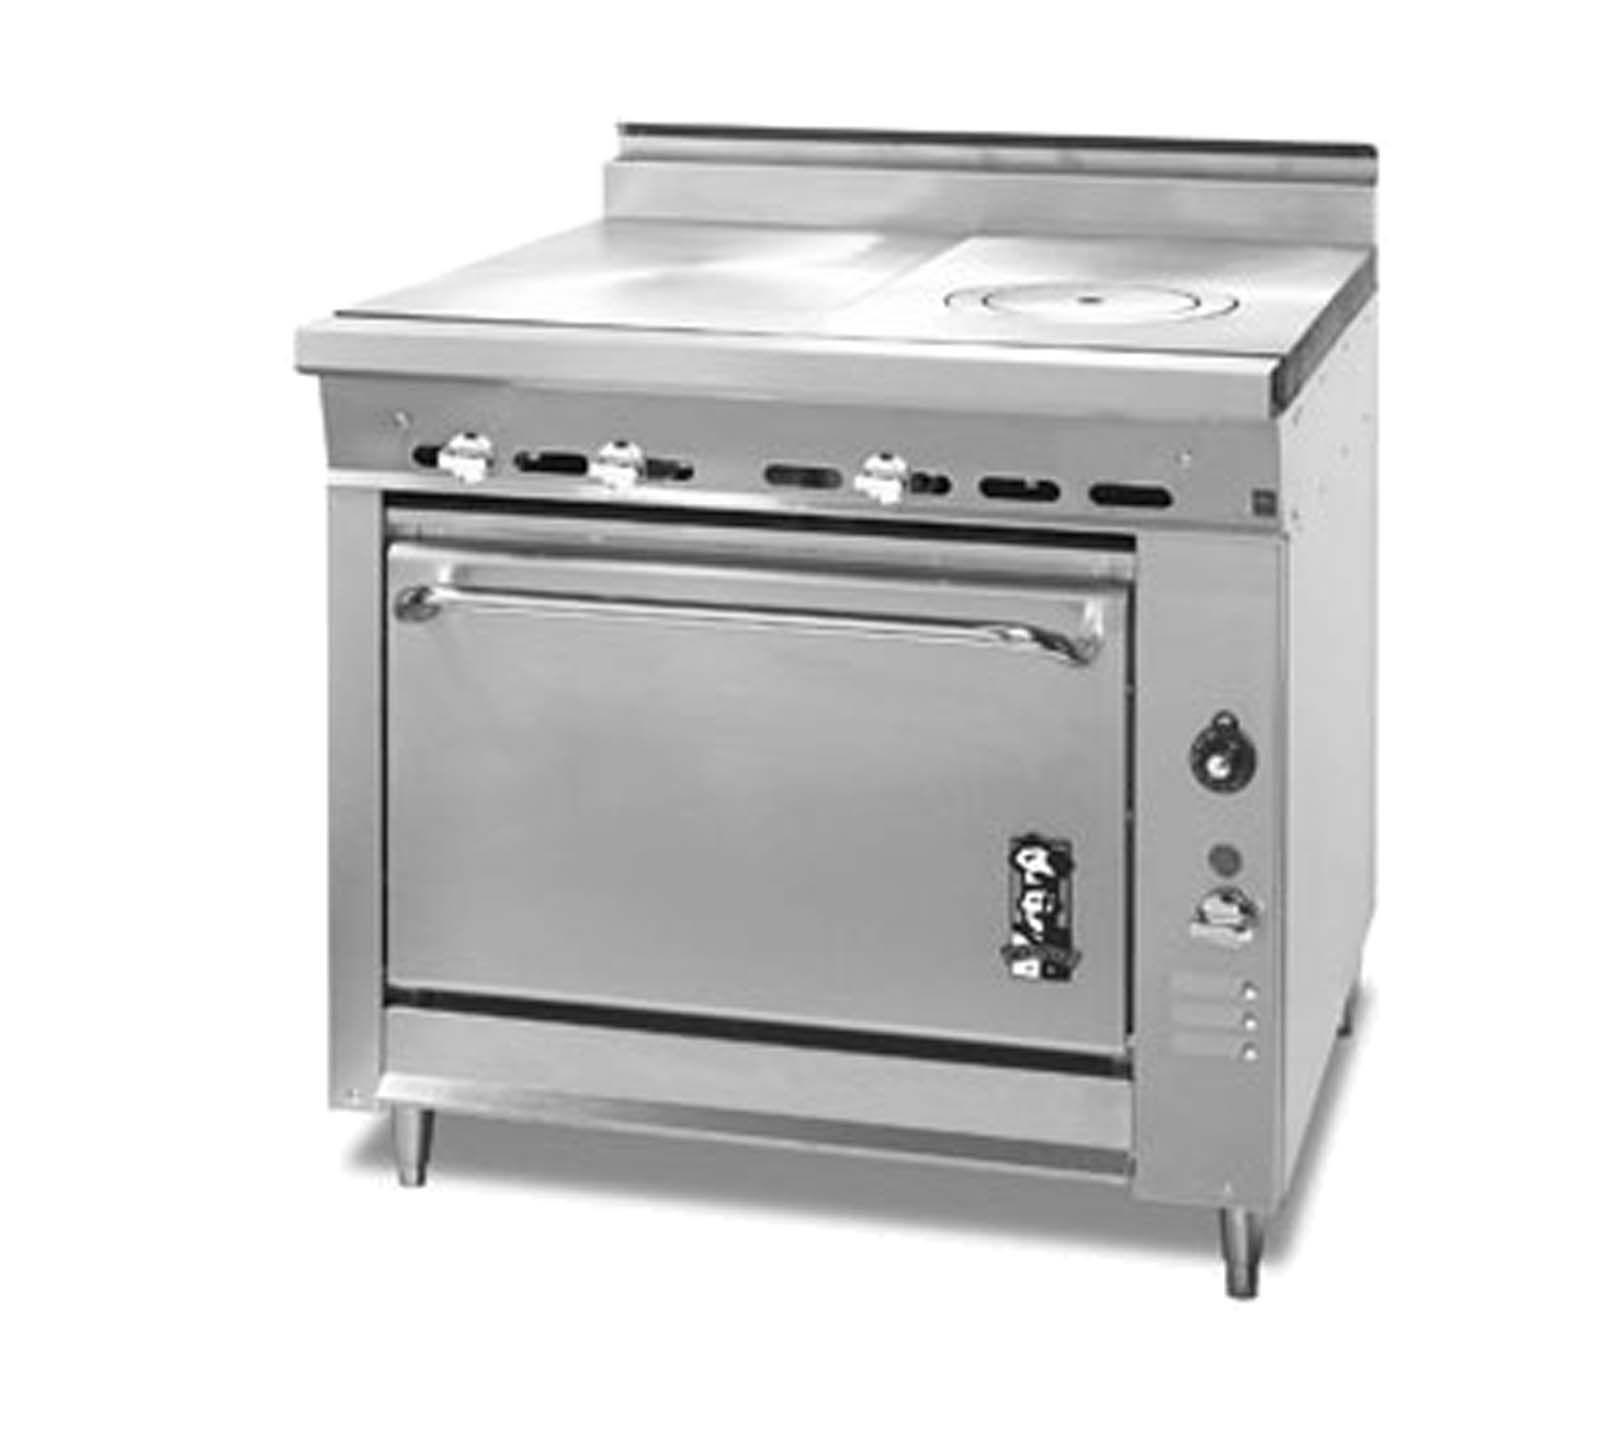 Montague French Top Range French Top Kitchen Appliances Kitchen